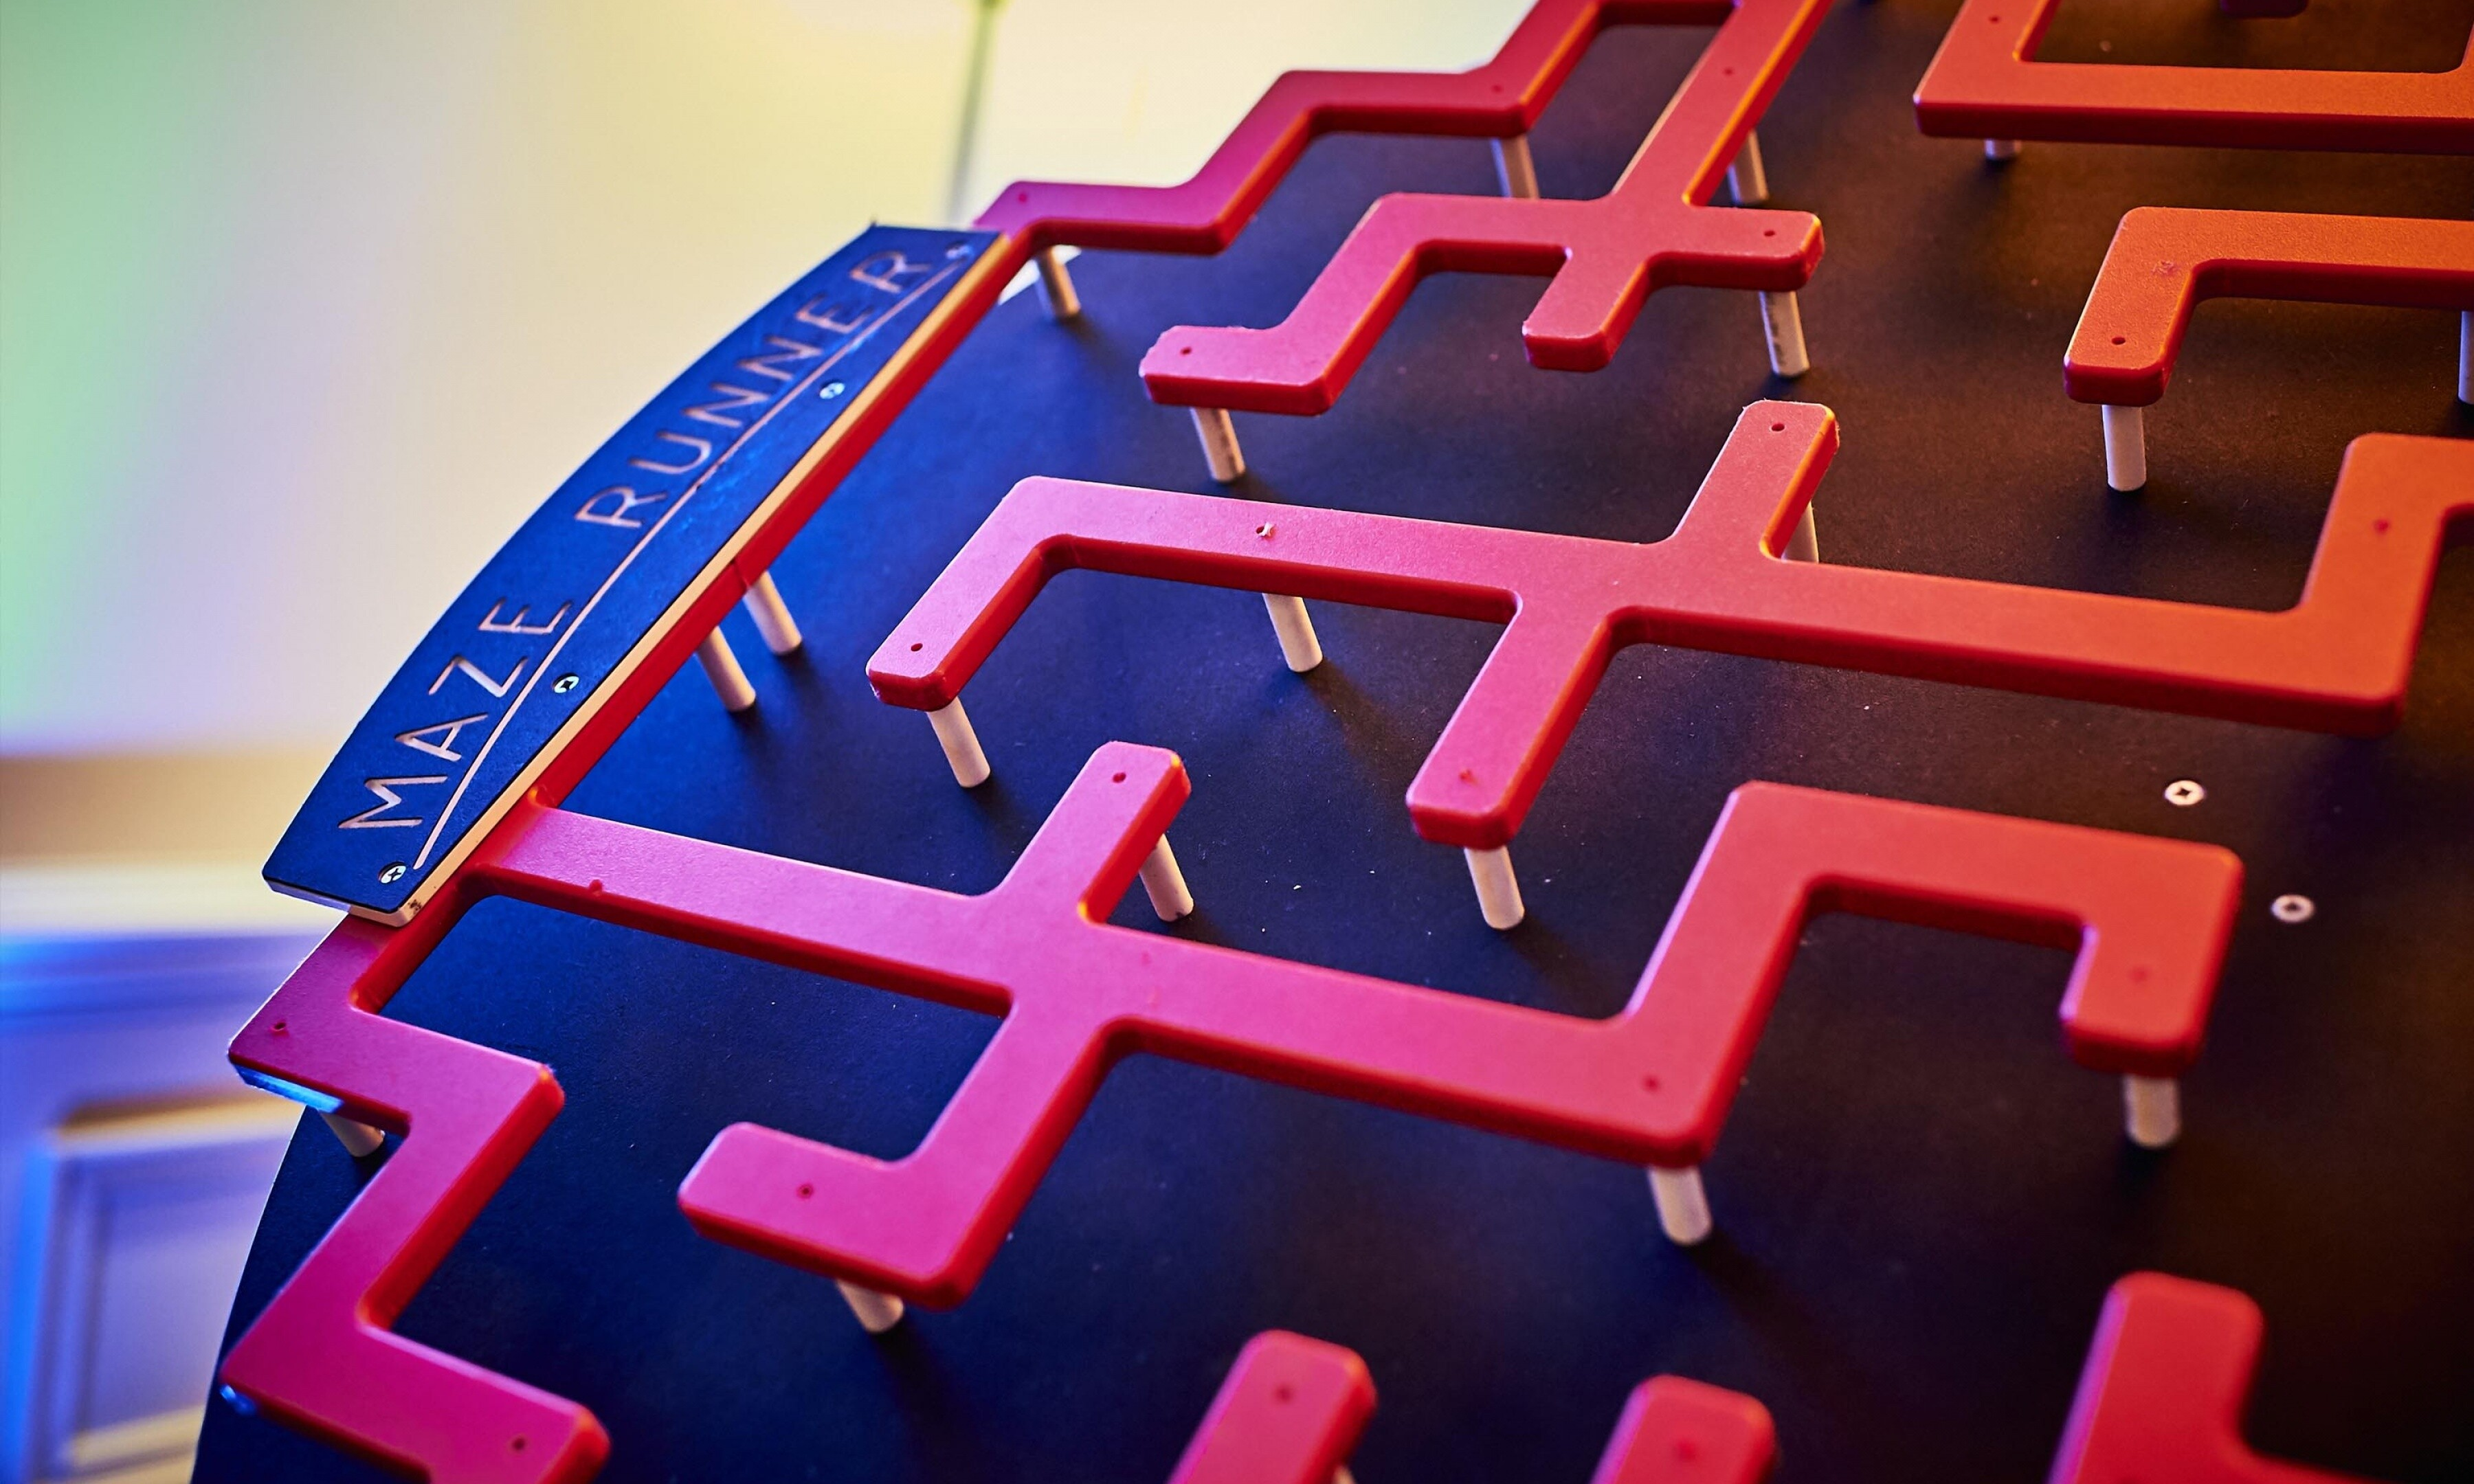 Maze runner retro games